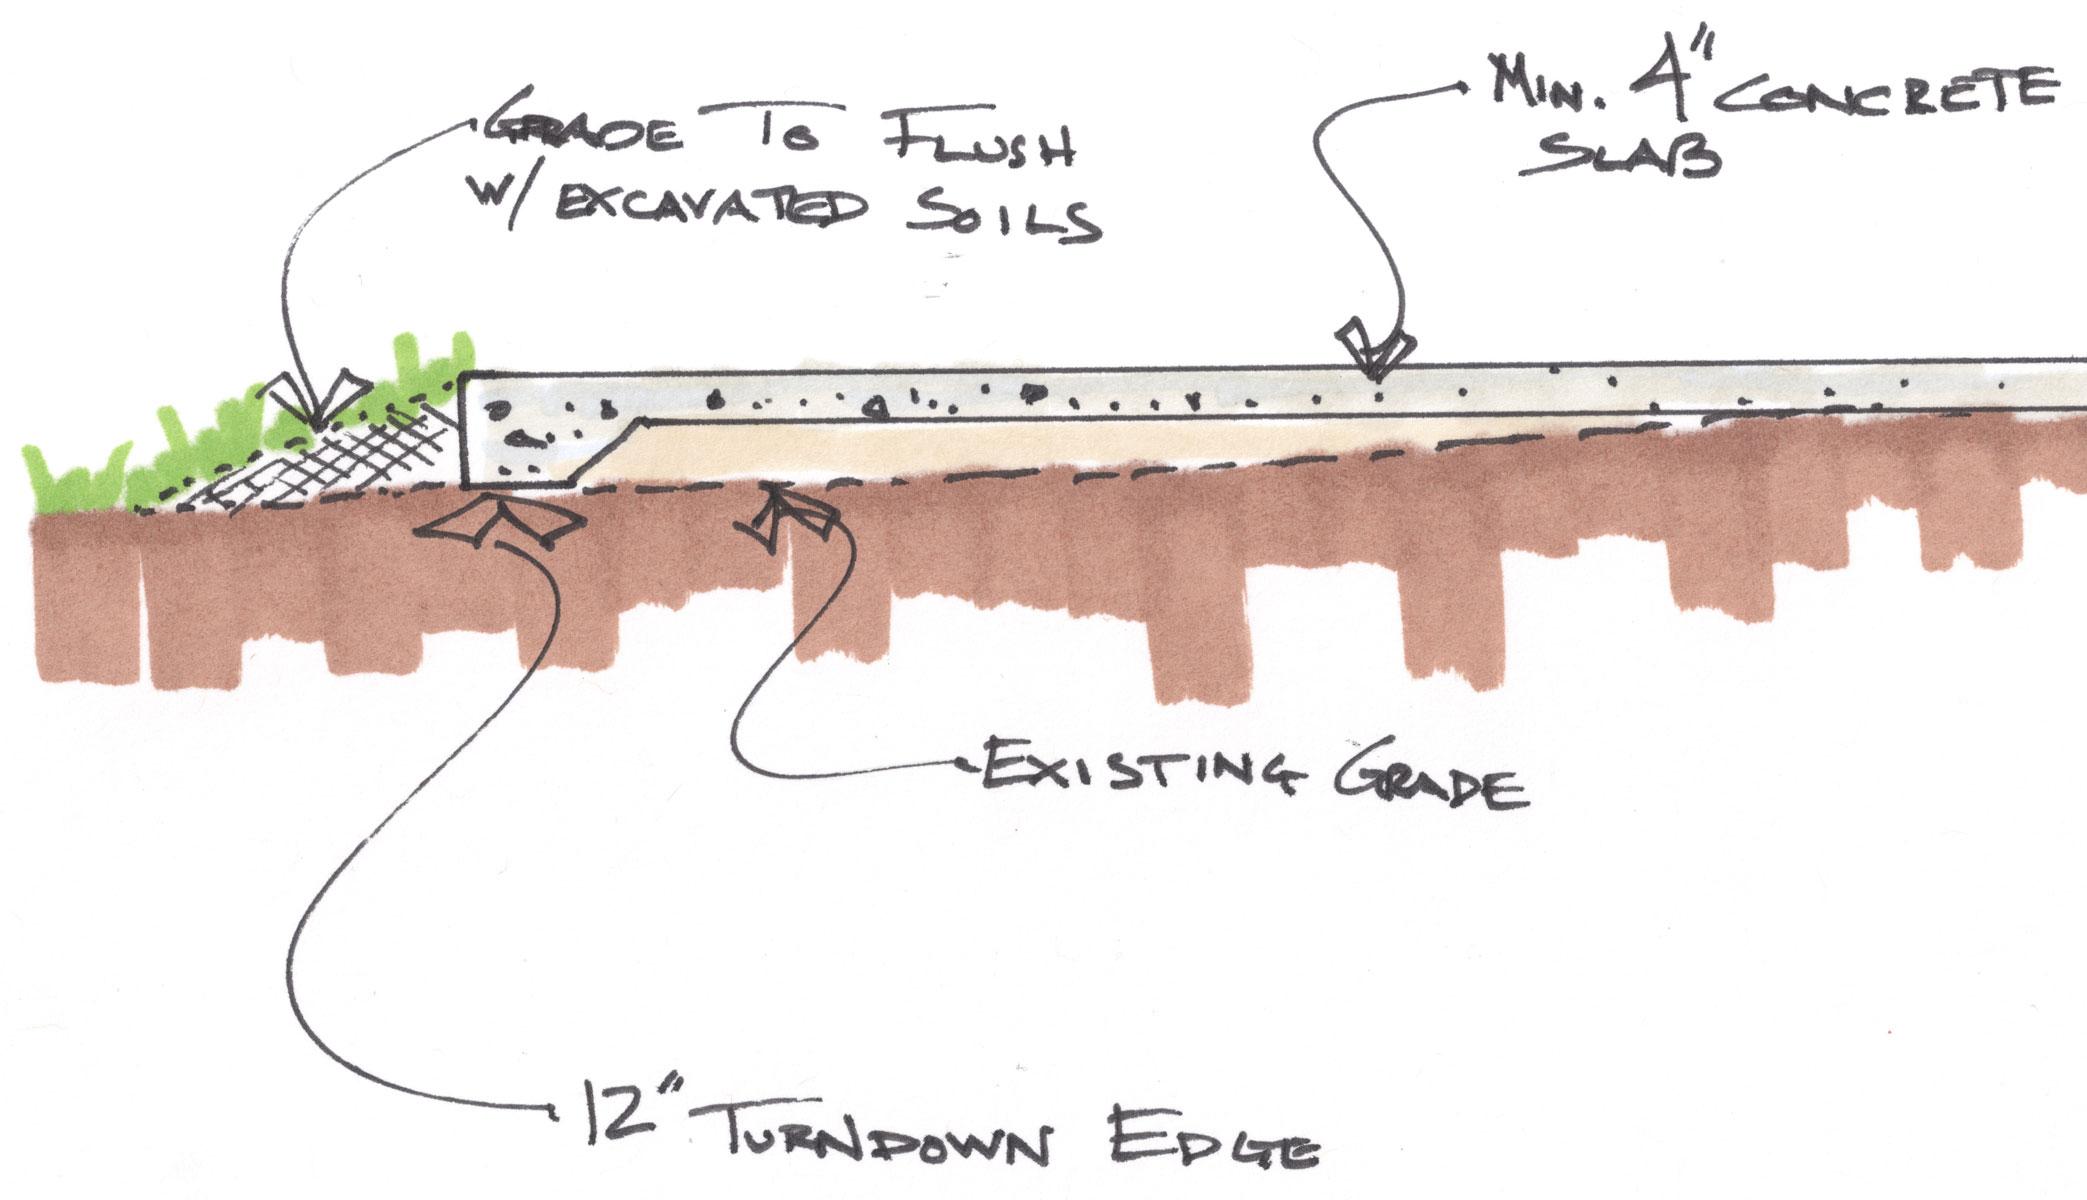 what is a concrete turndown edge on a